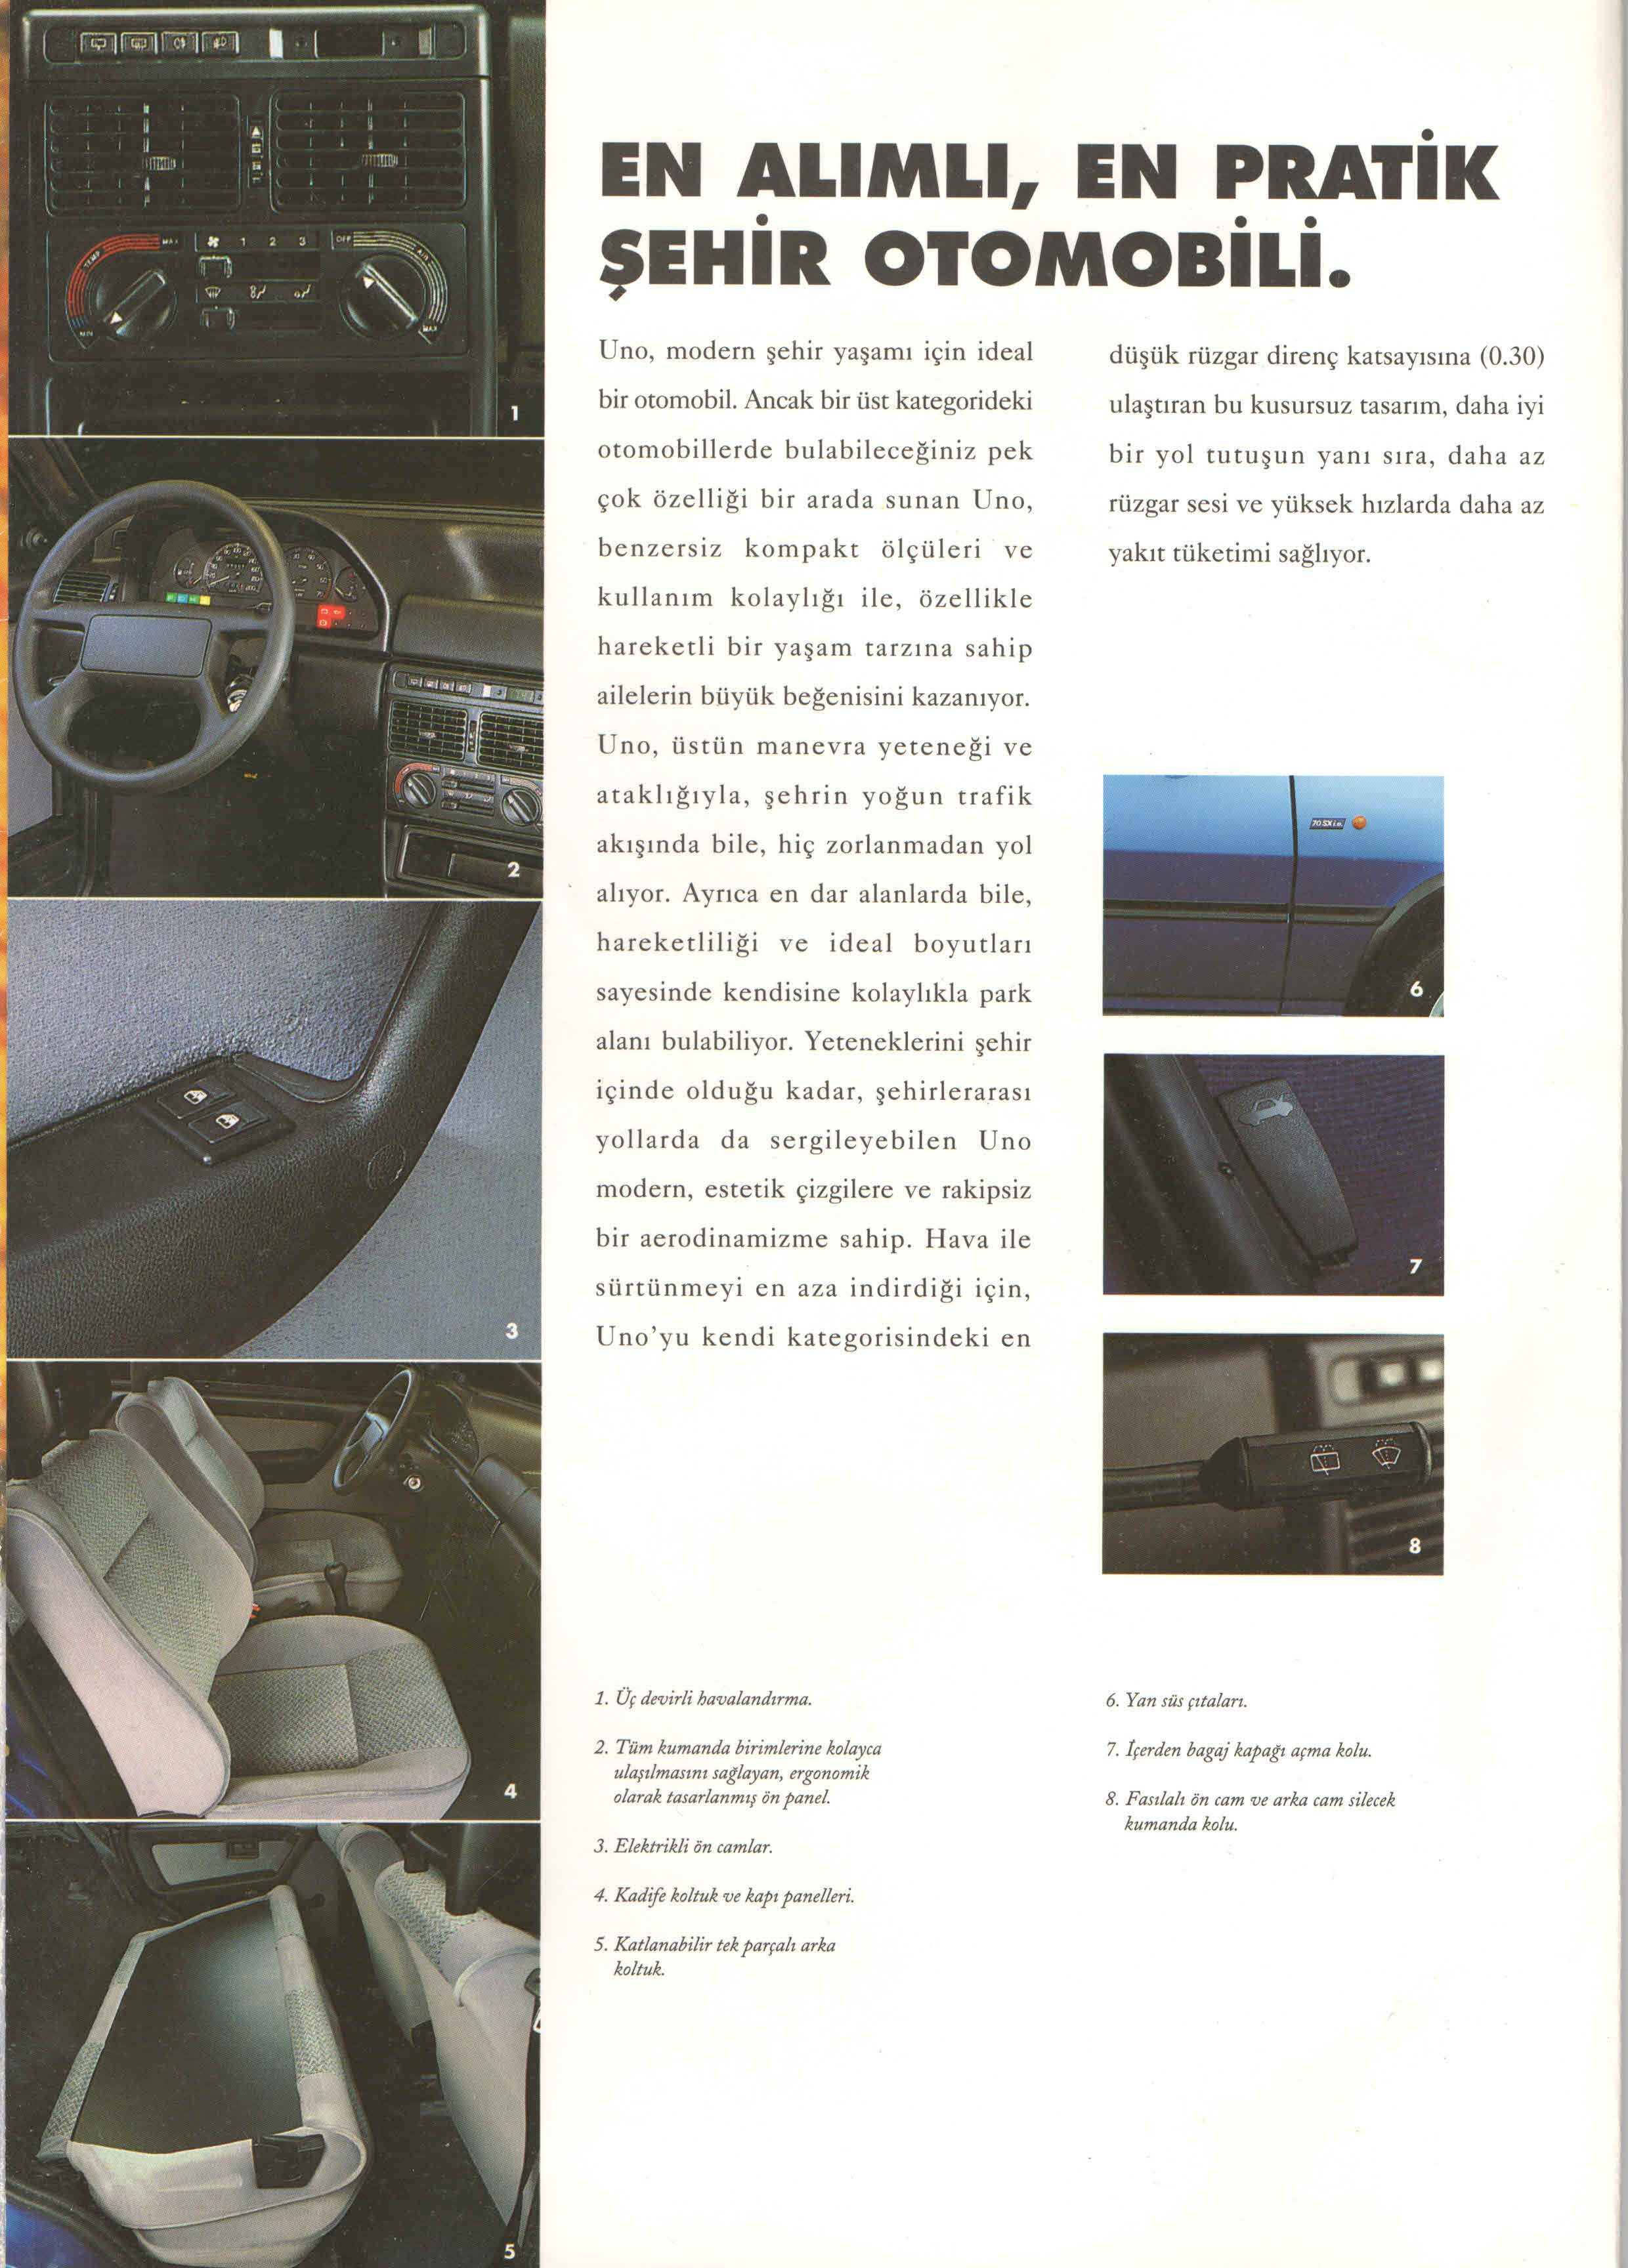 1996 Fiat Uno Turkish Catalog Page 4 8 1996 Fiat Uno Turkce Katalog Sayfa 4 8 Brosur Otomobil Gecmis Zaman